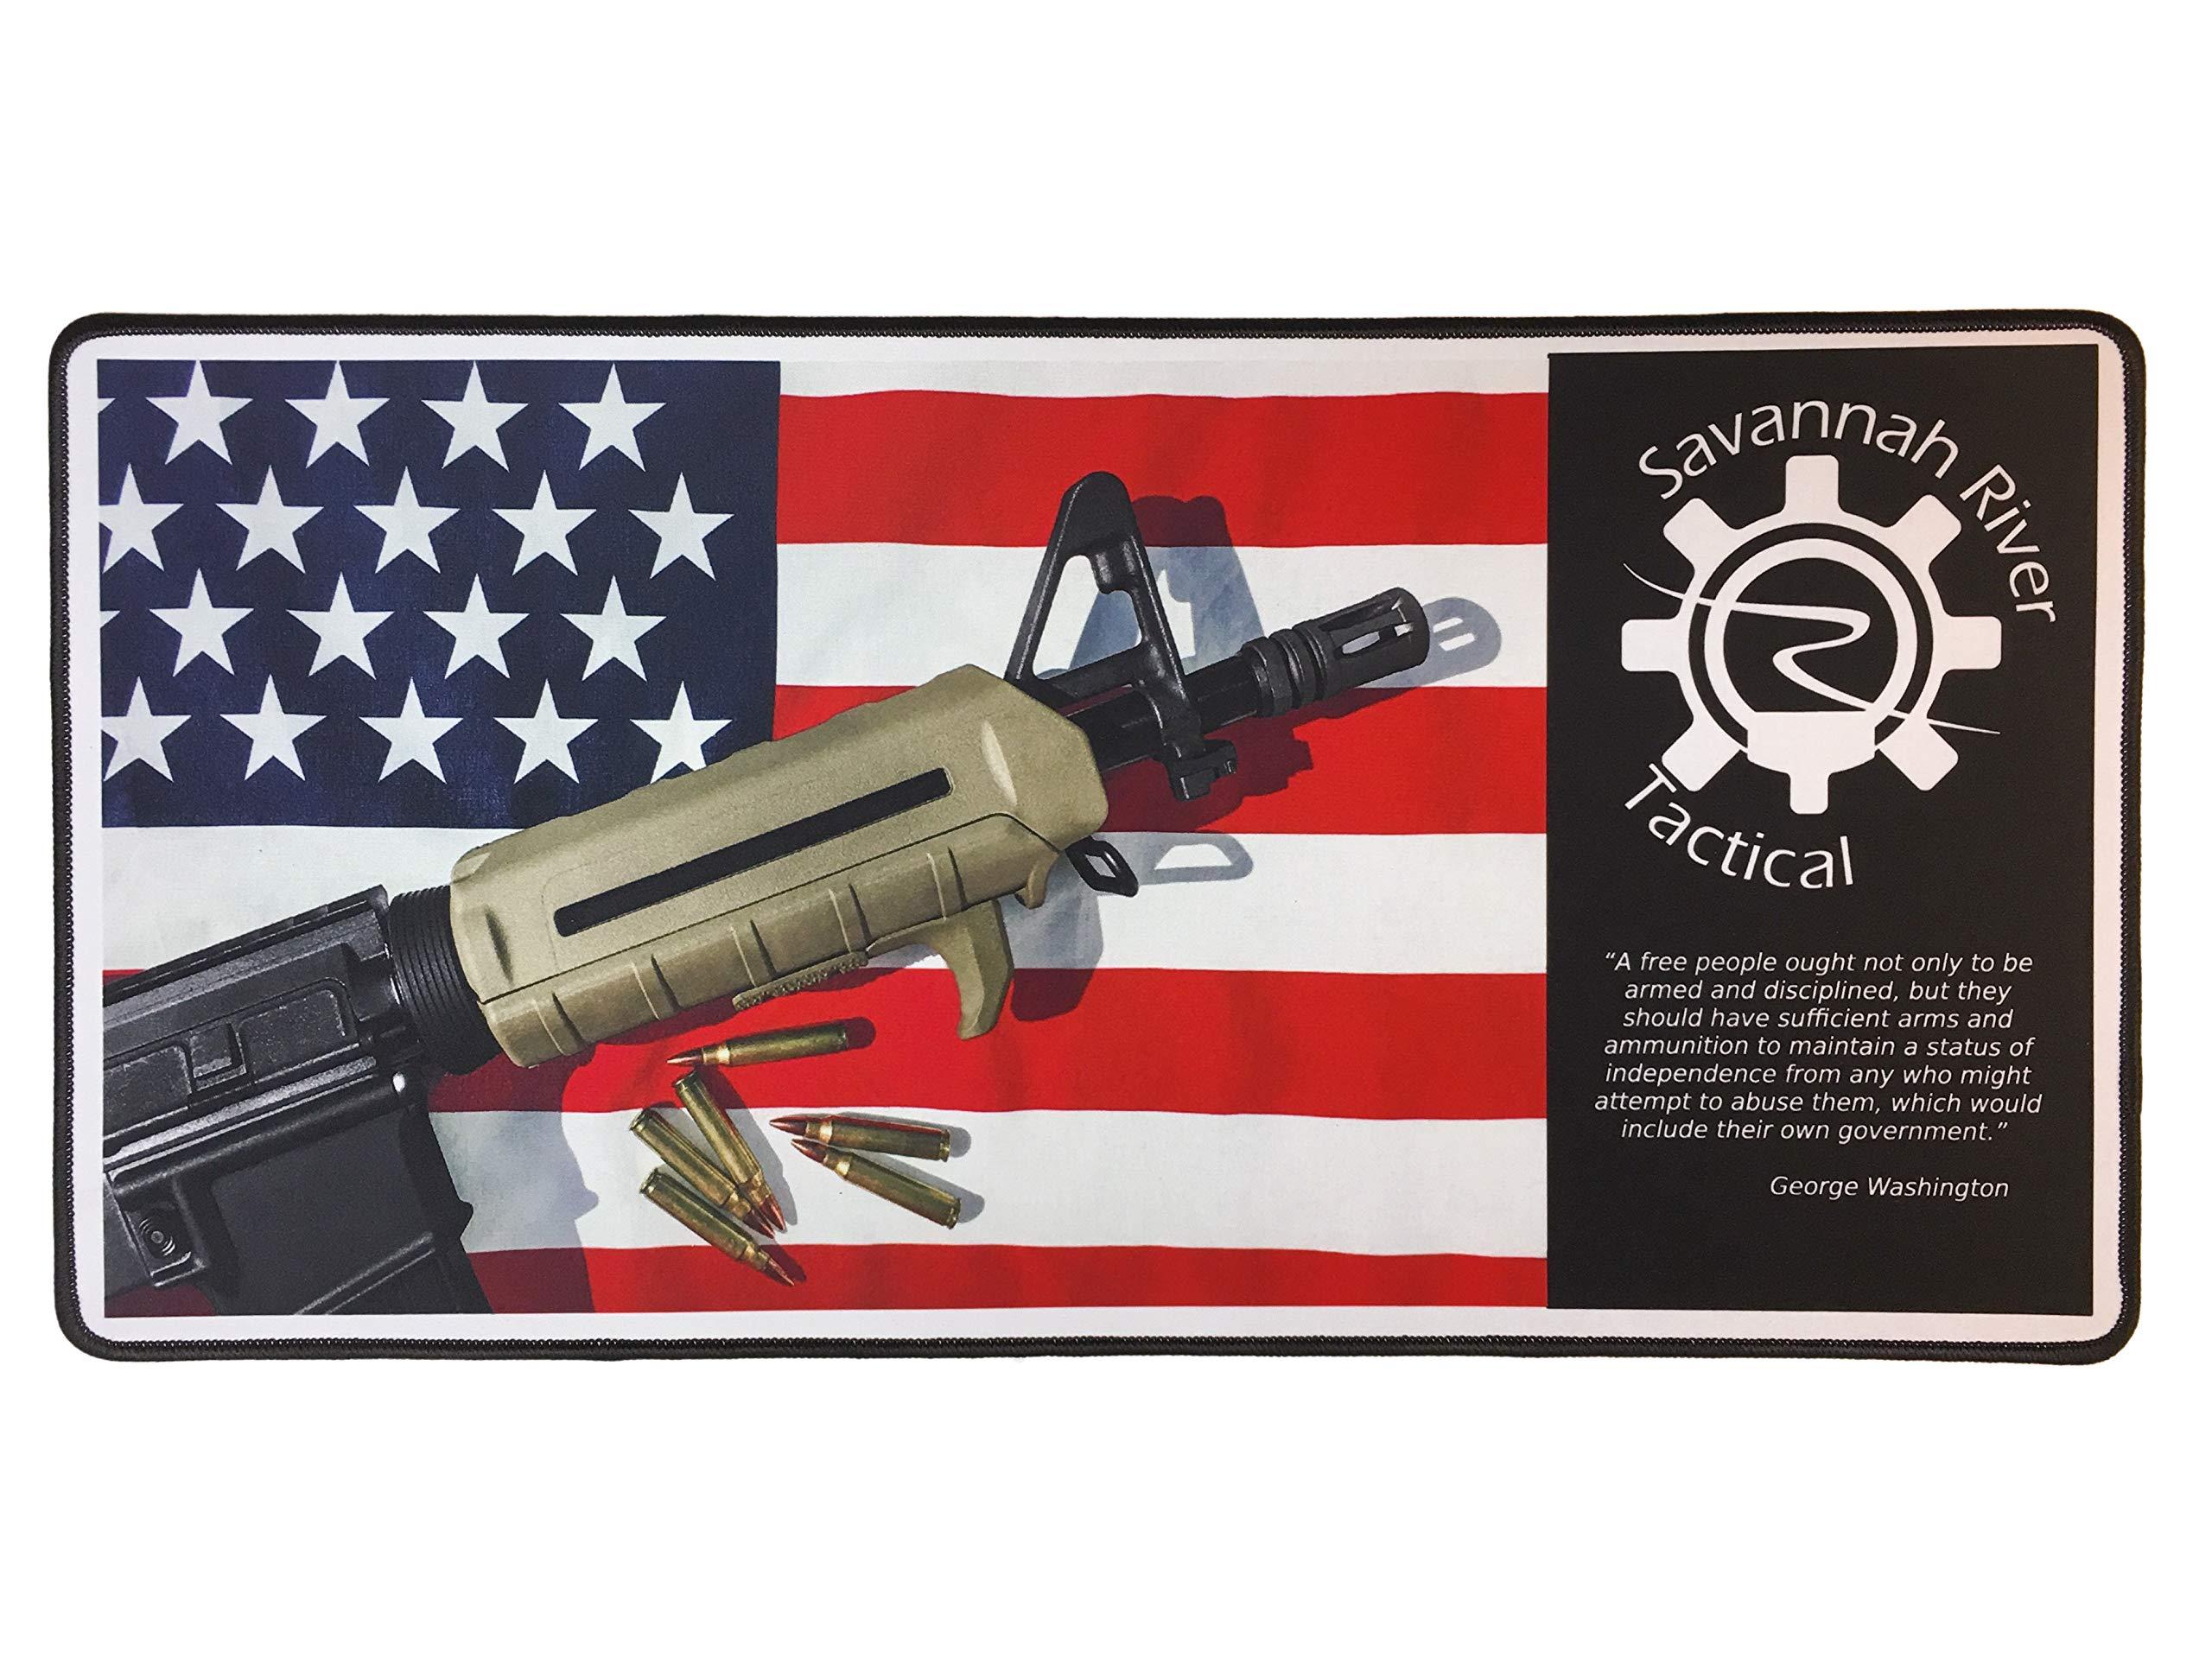 Universal Cleaning Pistol Glock AR15